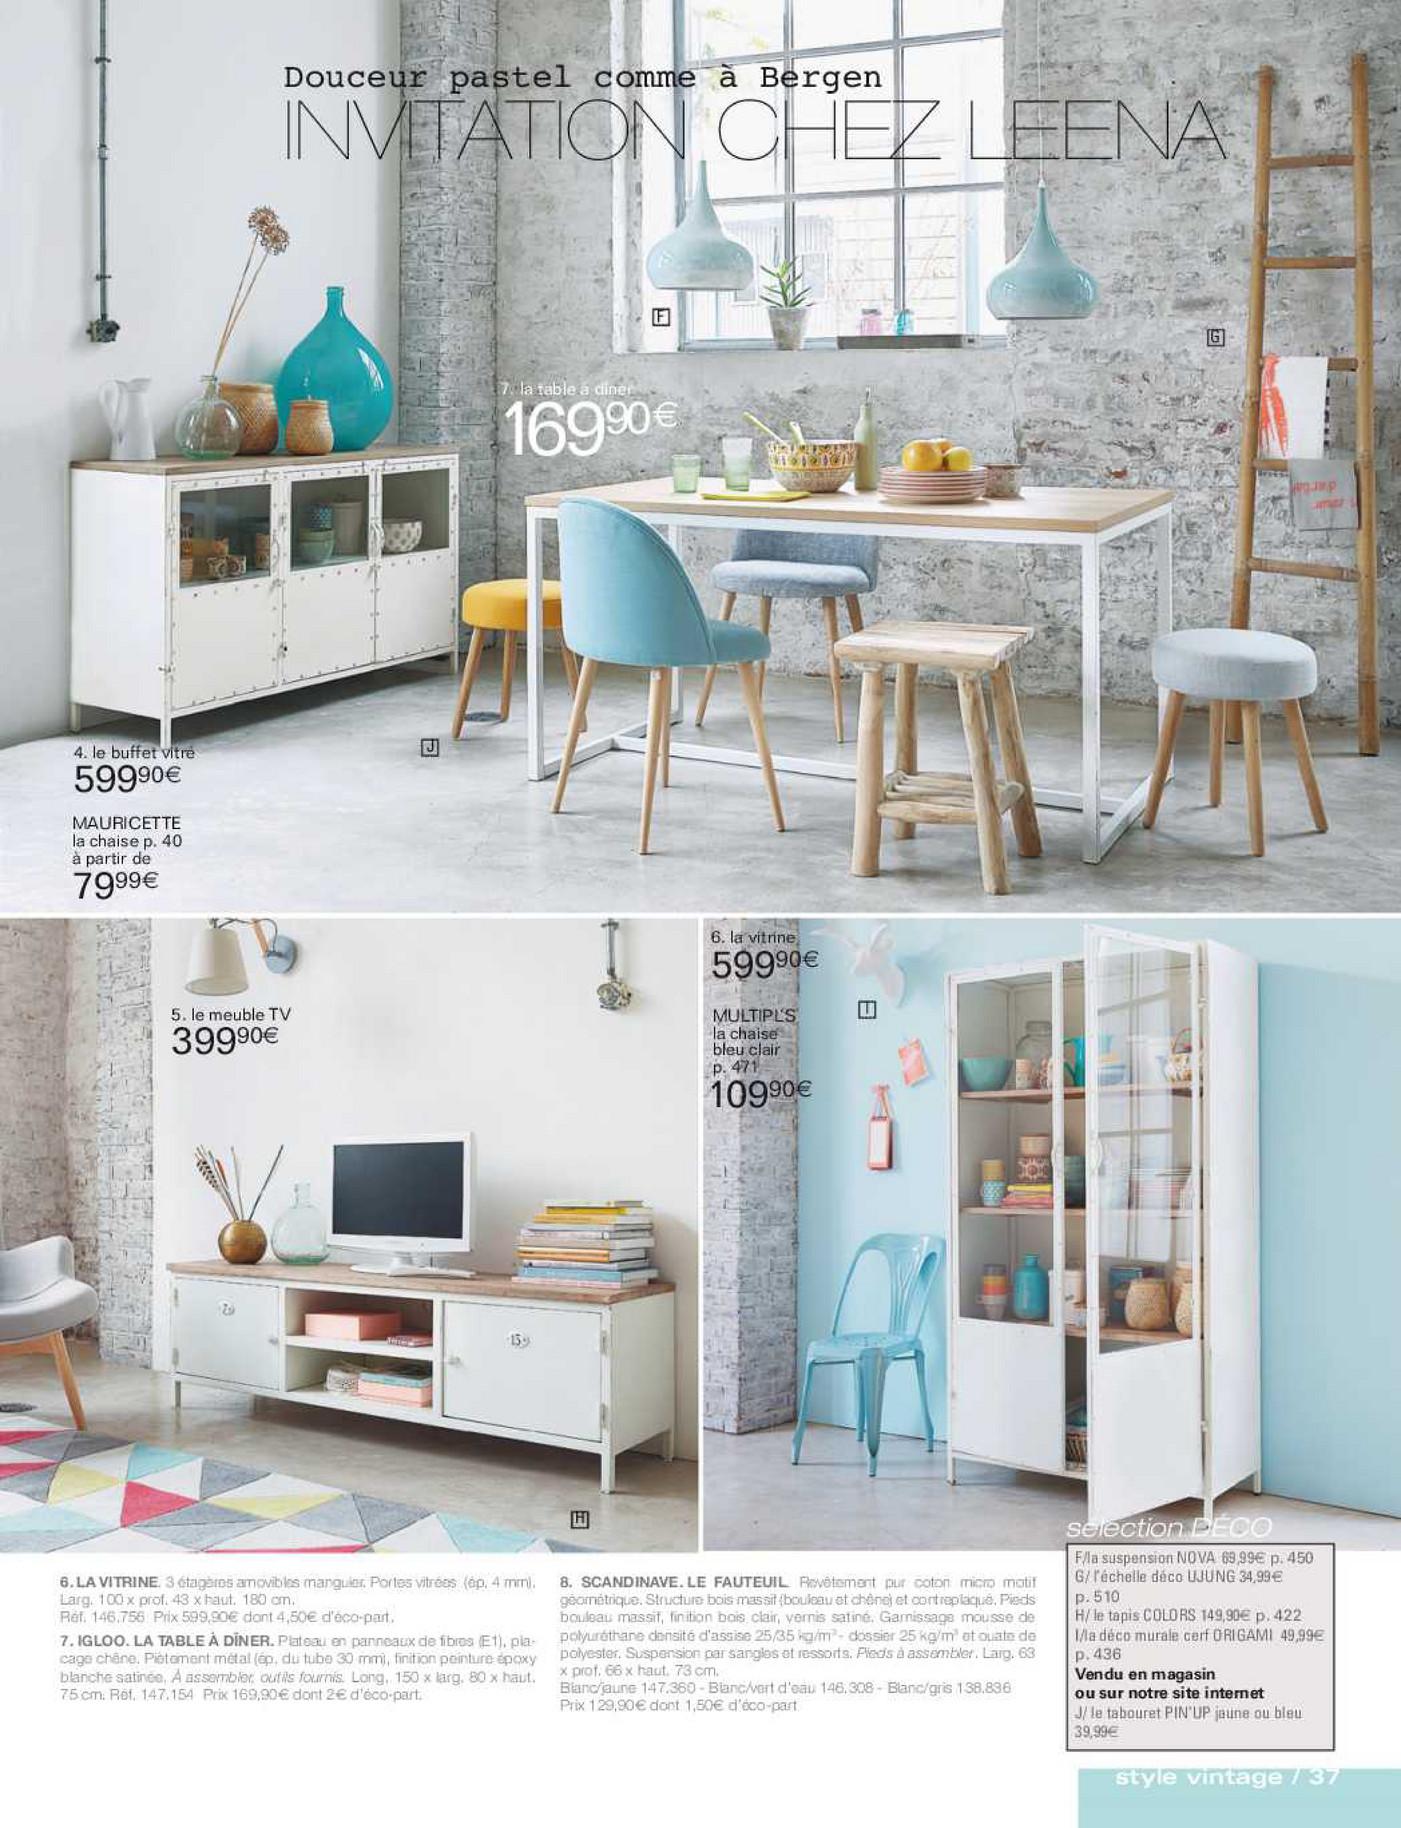 Volantinofacile catalogo maisons du monde 2015 pagina for Maison du monde 2015